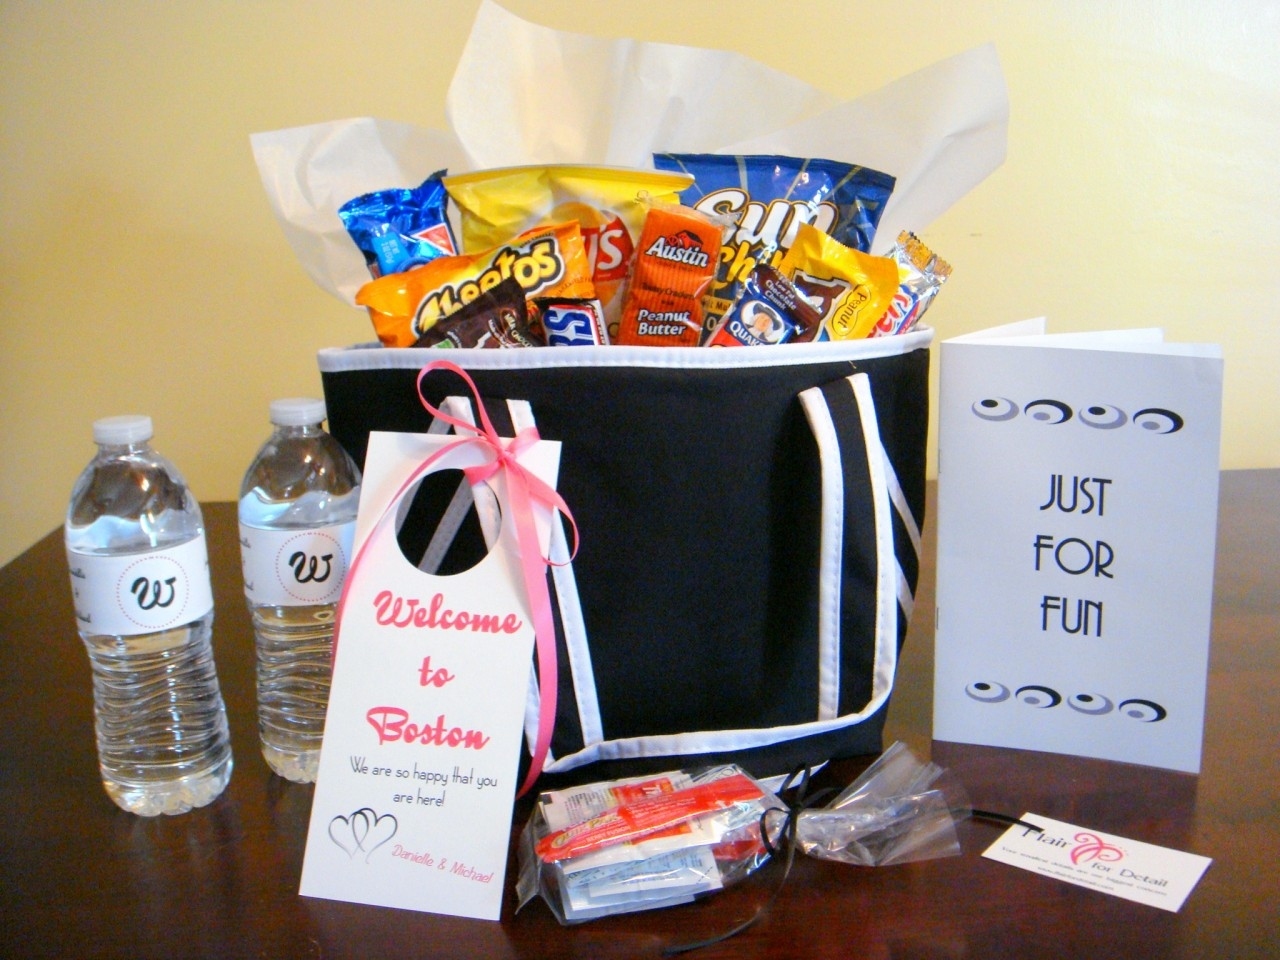 Detroit Michigan Wedding Planner Blog: Hospitality Bags